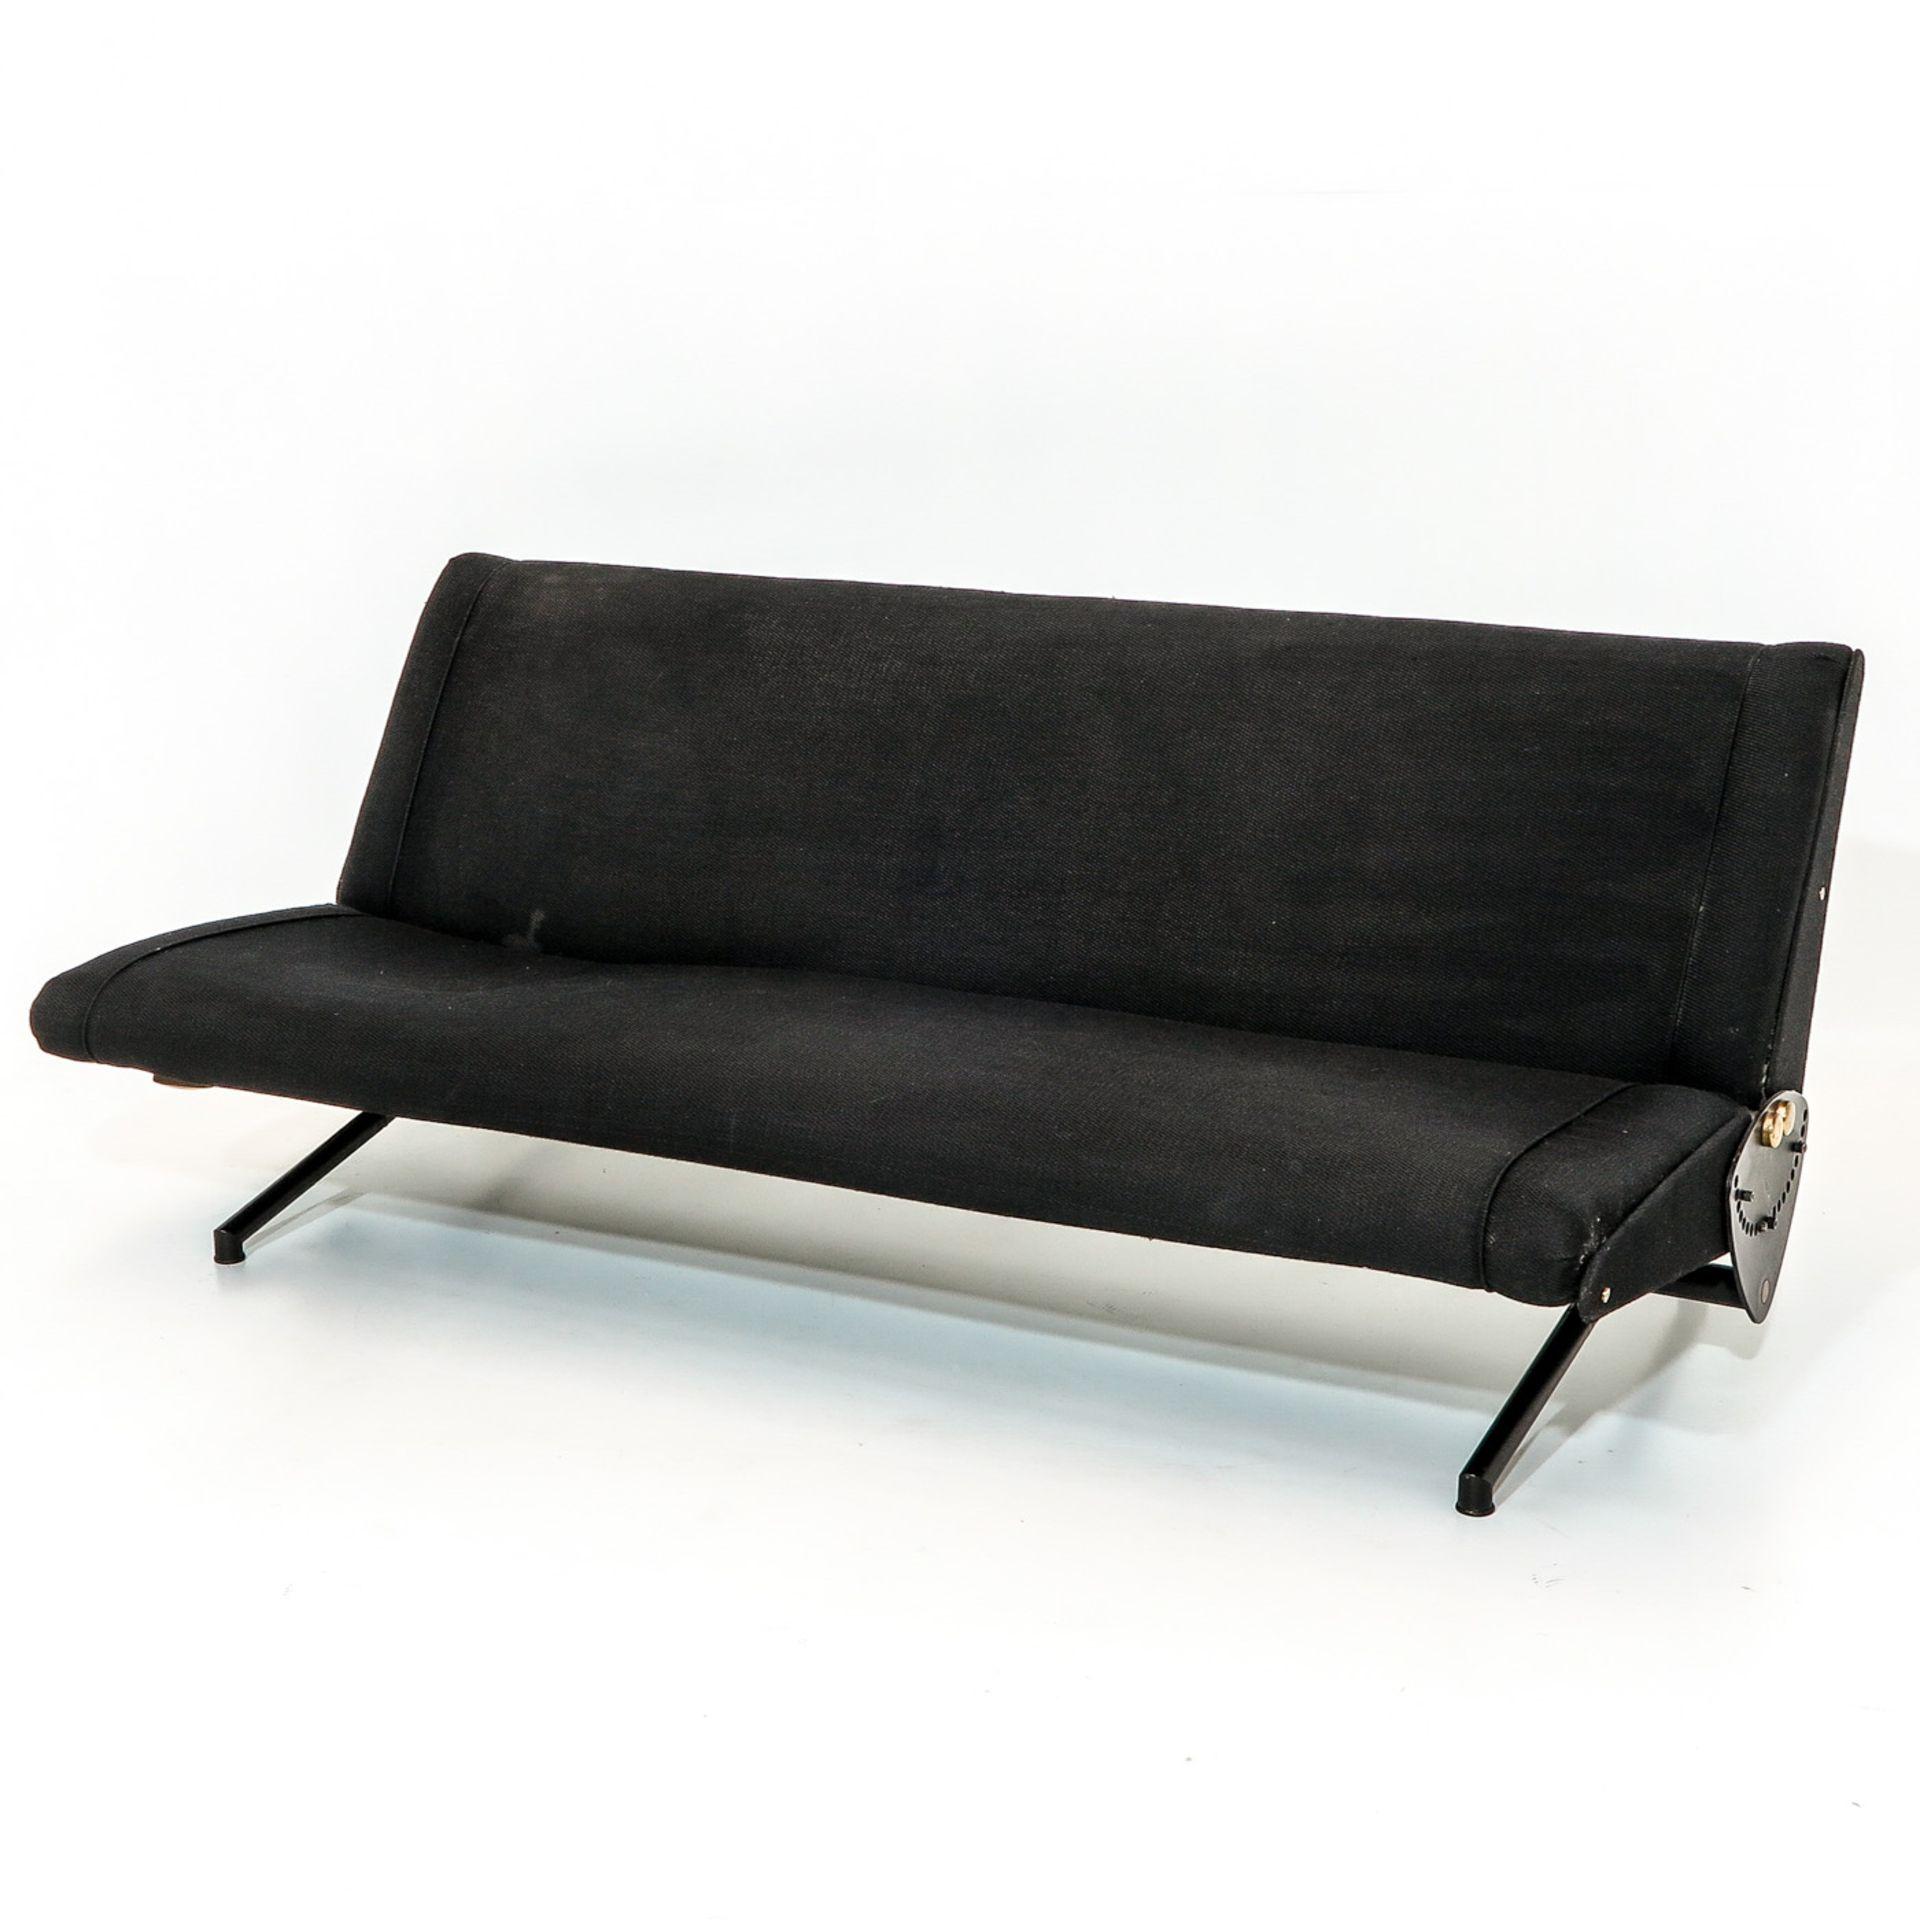 Los 1151 - A Osvaldo Borsani Designer Sofa